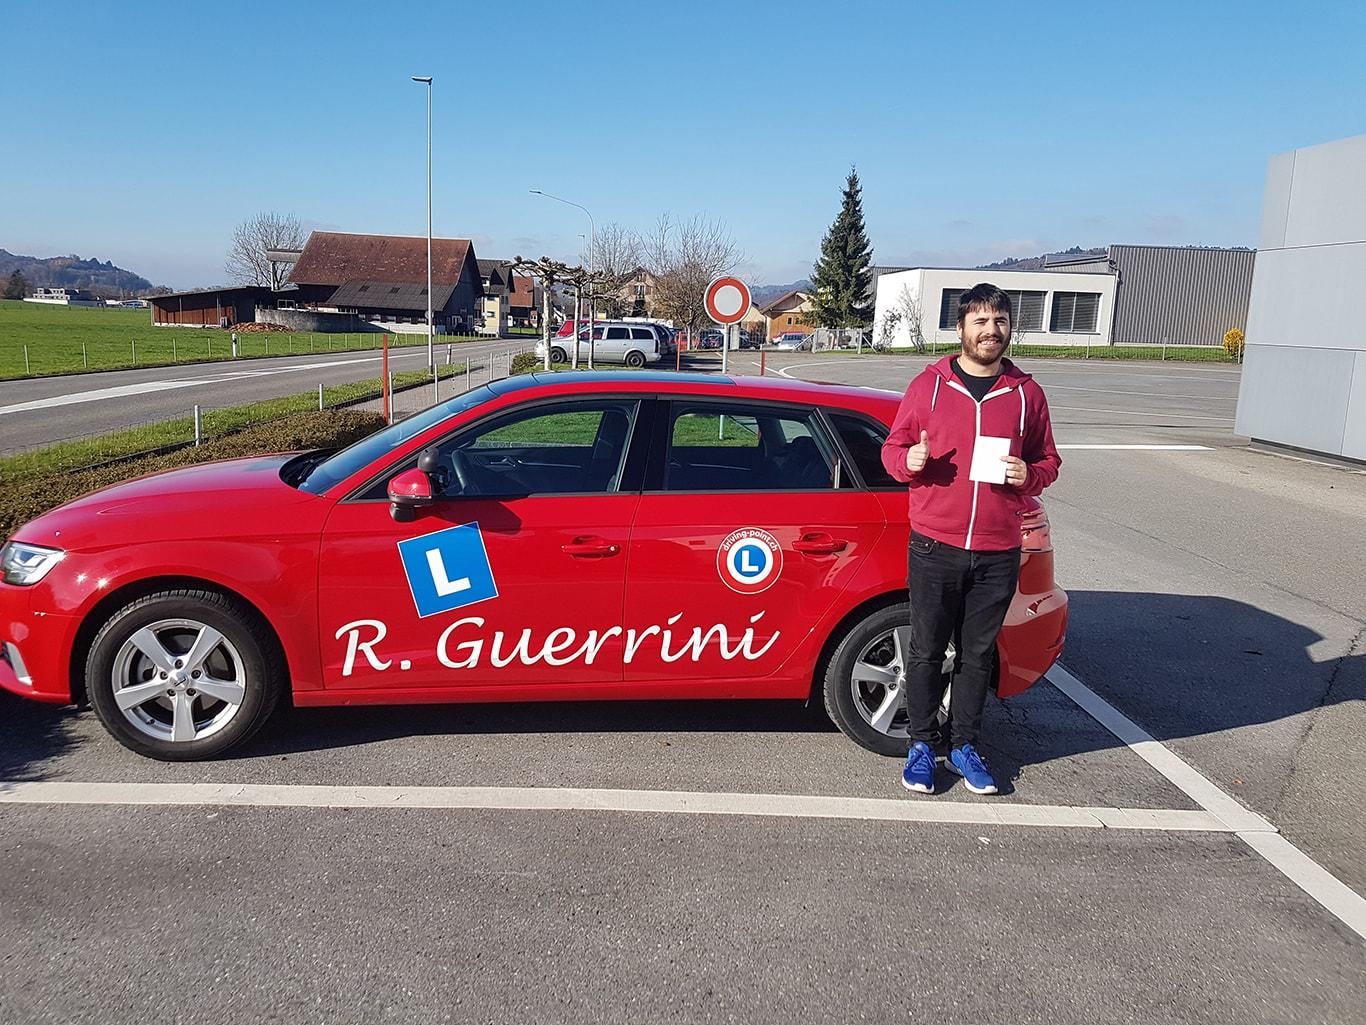 Theorieprüfung, Nothelferkurs & Verkehrskunde in Rapperswil - Fahrschule Driving Point